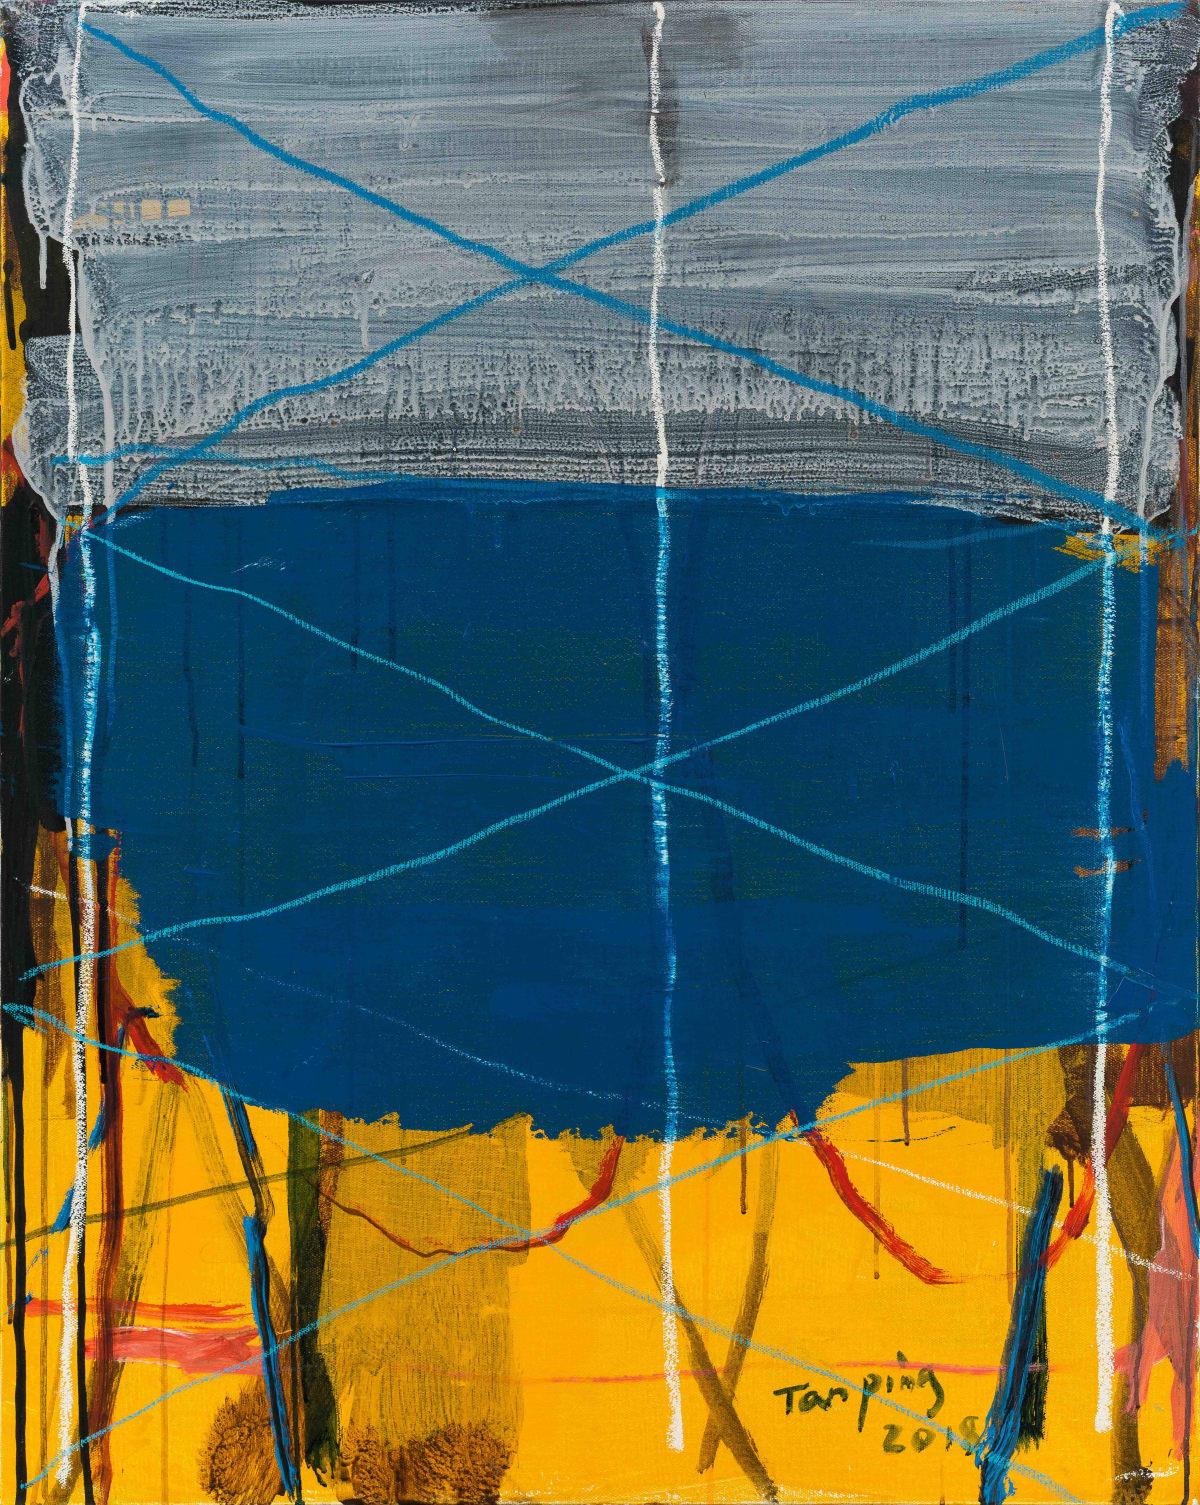 Tan Ping, Untitled, 2018